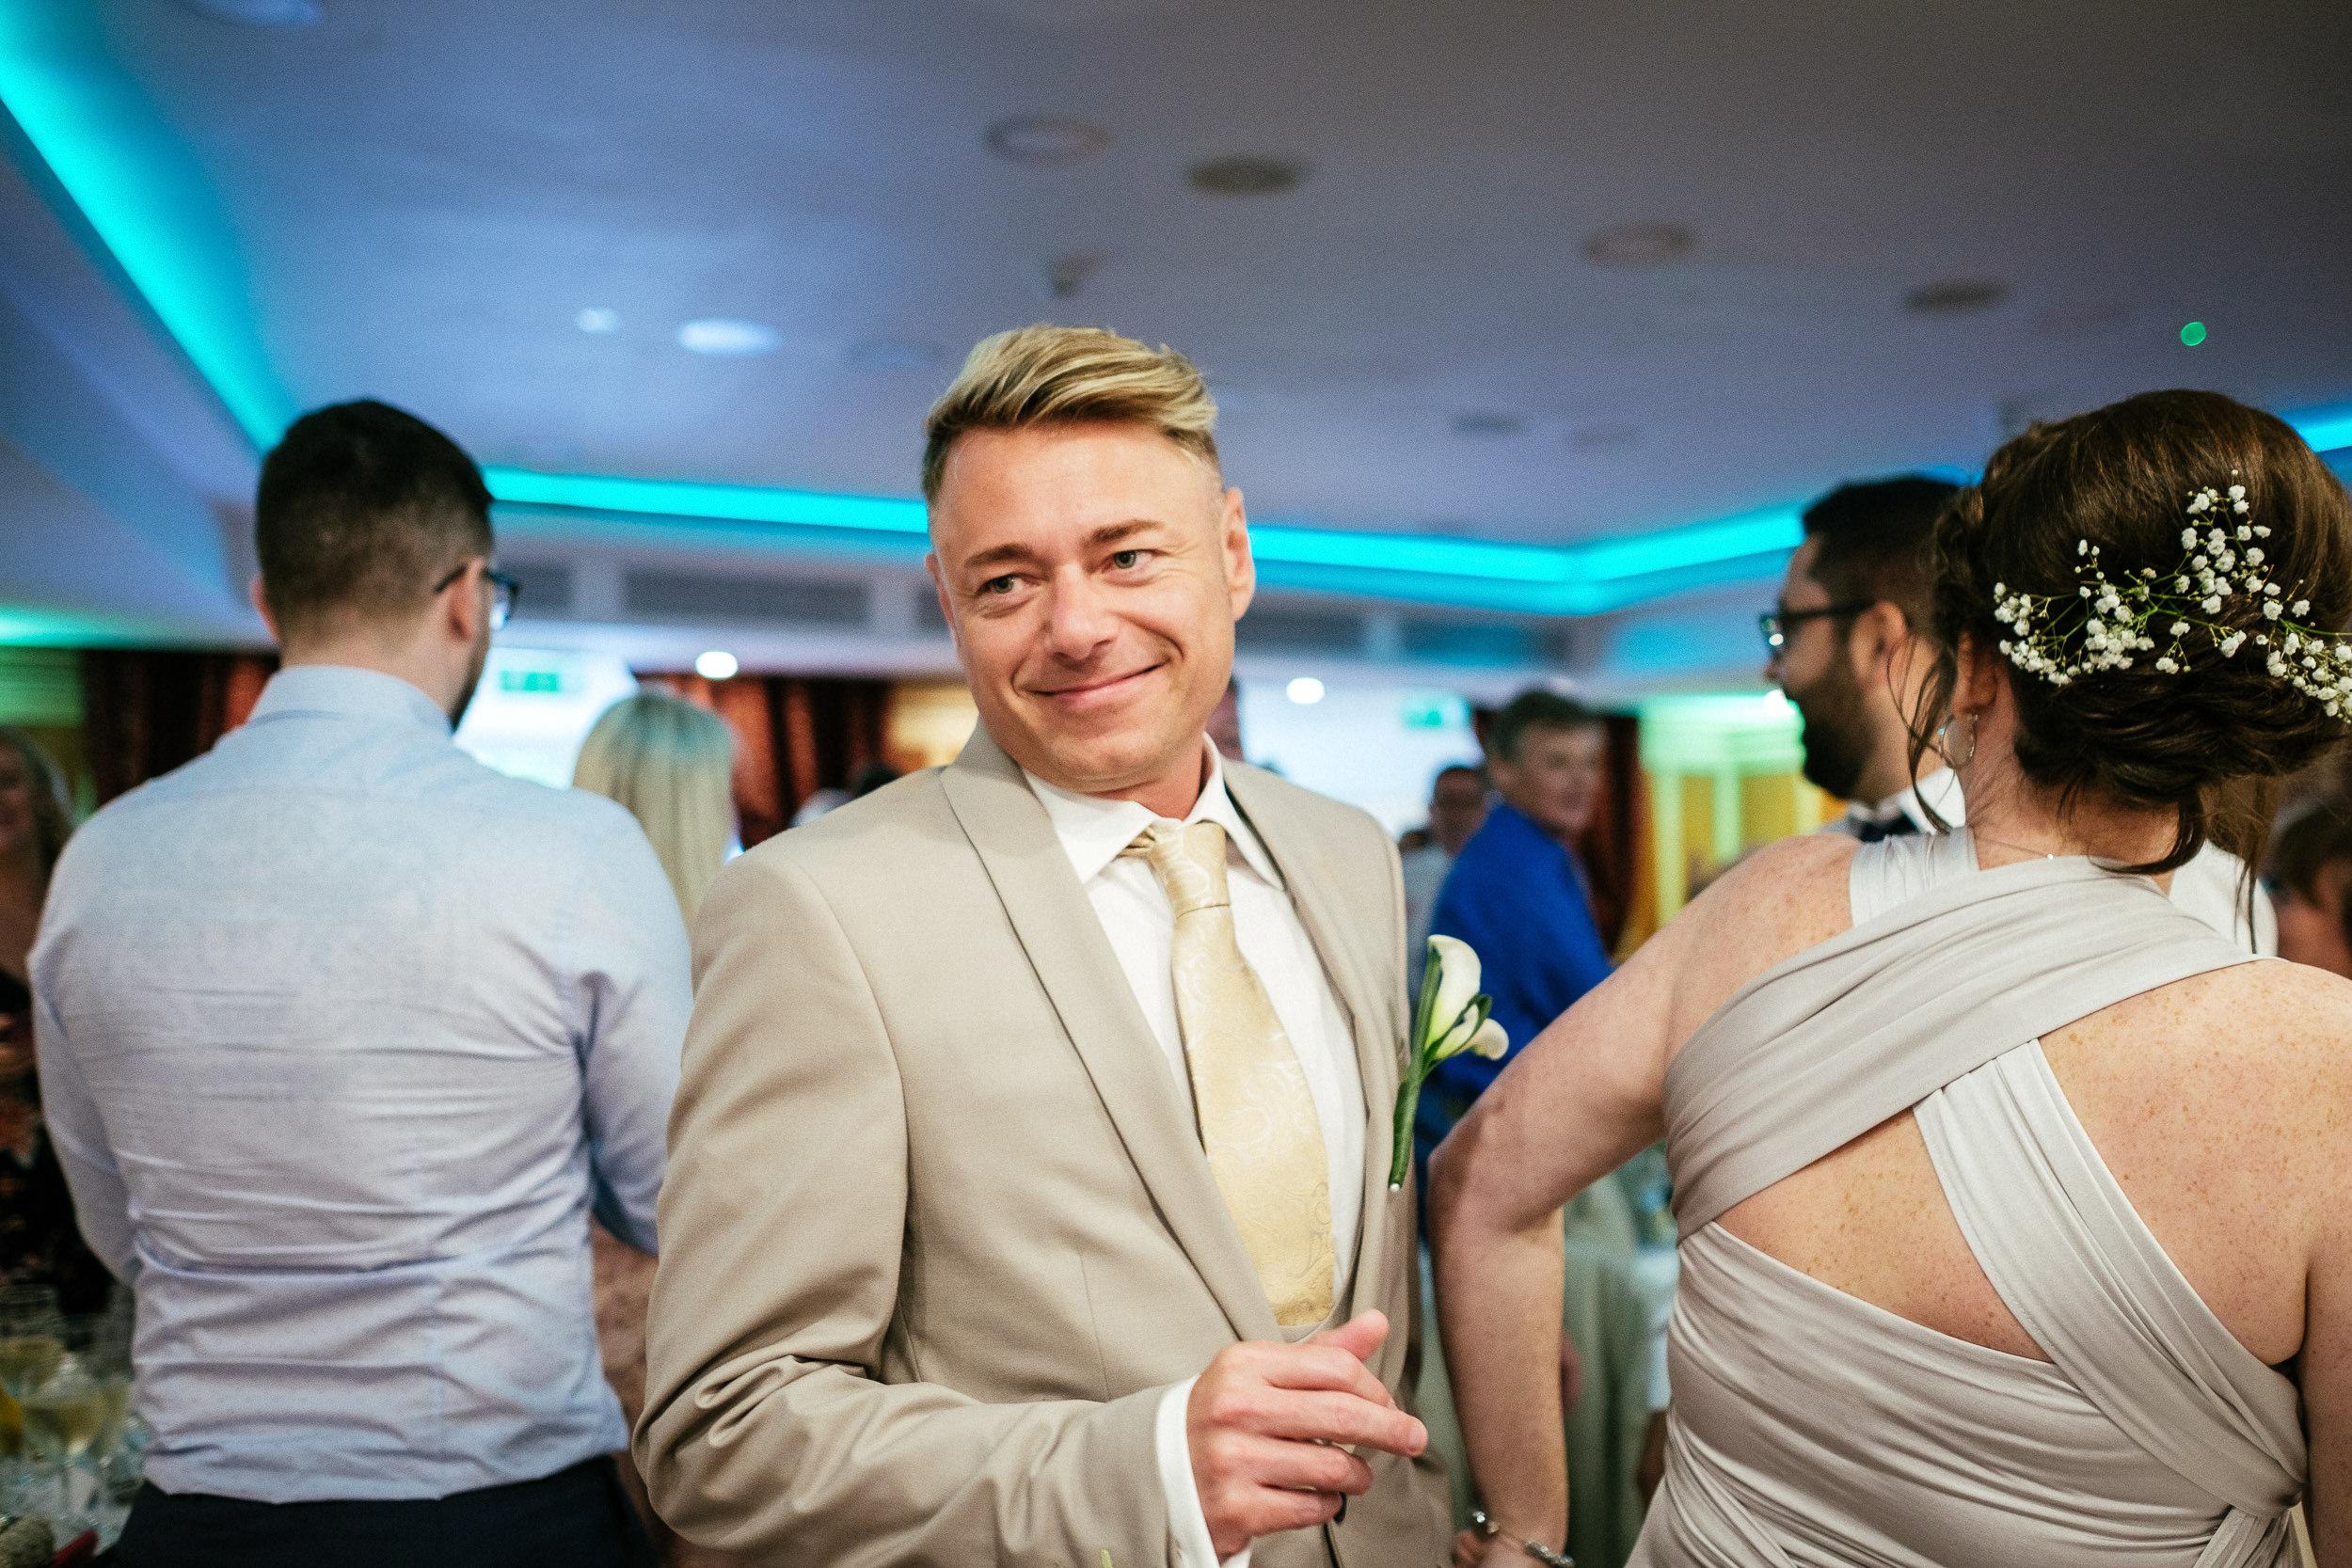 radisson blu stillorgan dublin Wedding Photographer 64